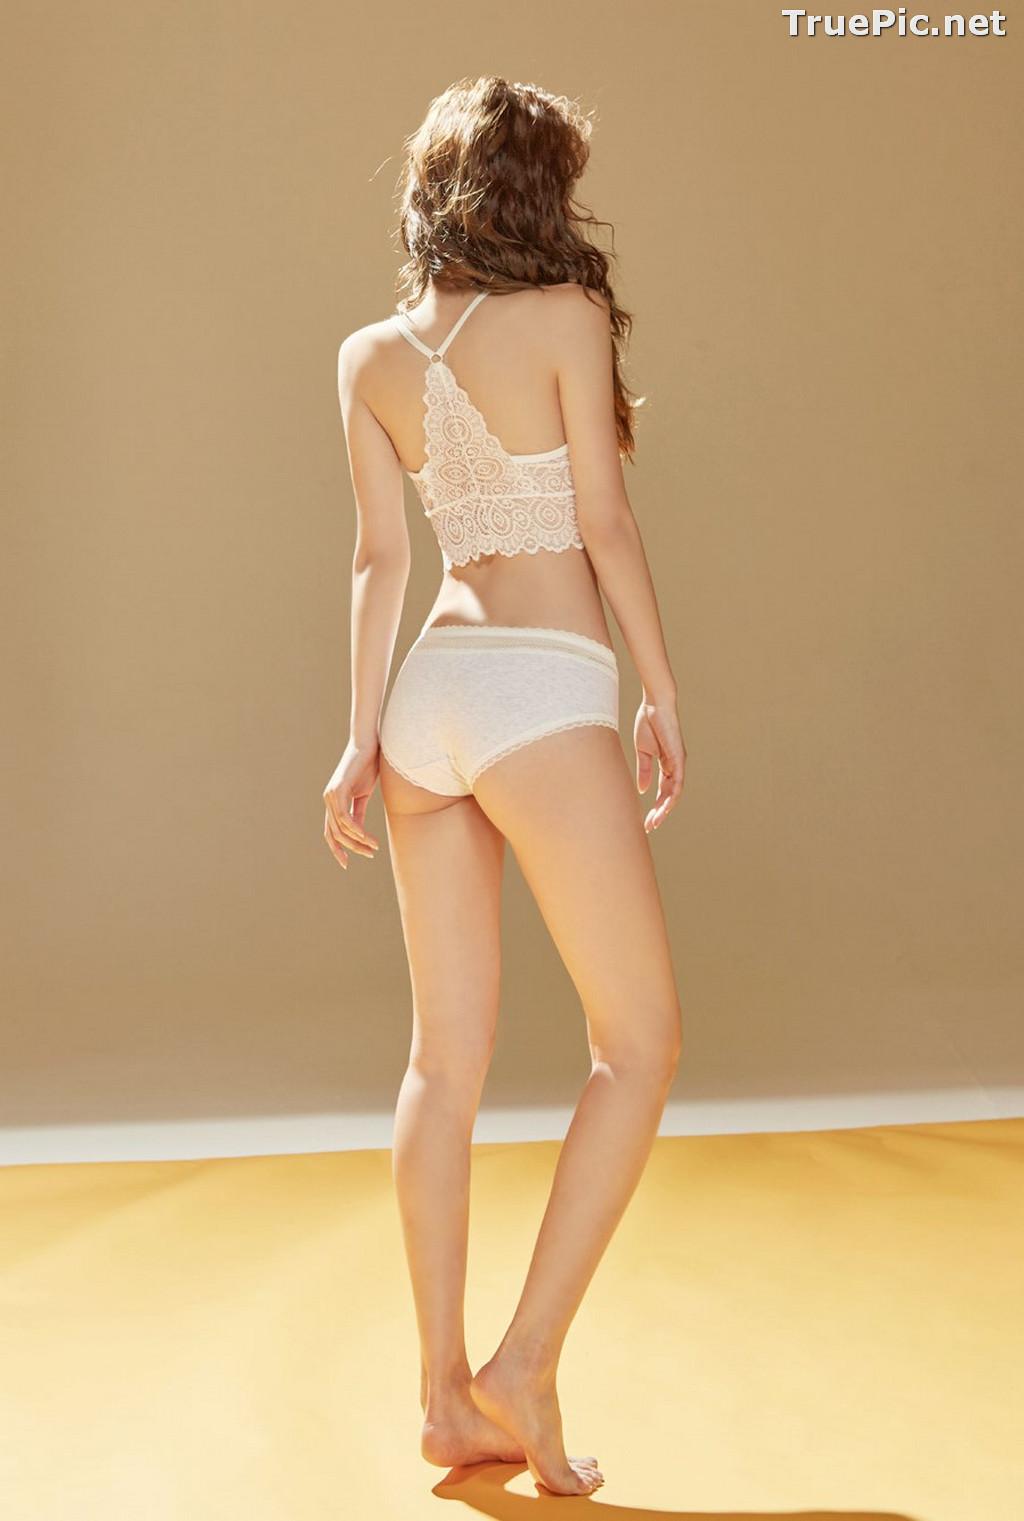 Image Korean Fashion Model – Lee Chae Eun (이채은) – Come On Vincent Lingerie #7 - TruePic.net - Picture-5